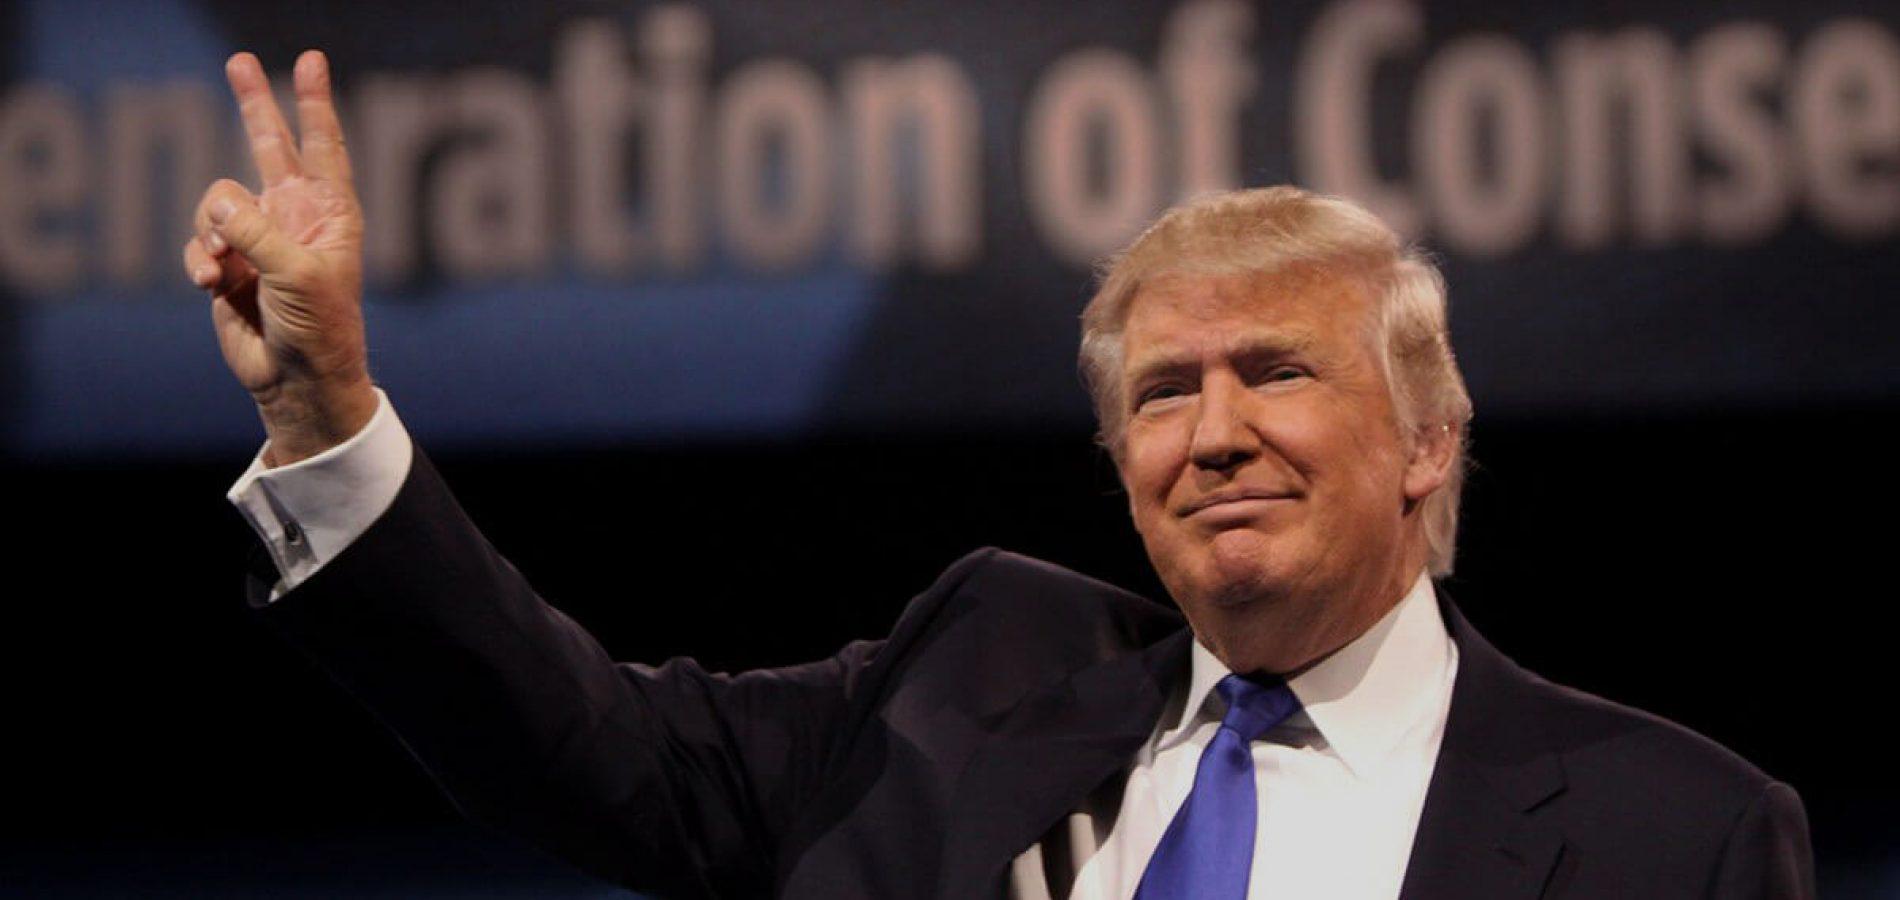 Presidente Donald Trump anuncia que irá proibir TikTok nos EUA